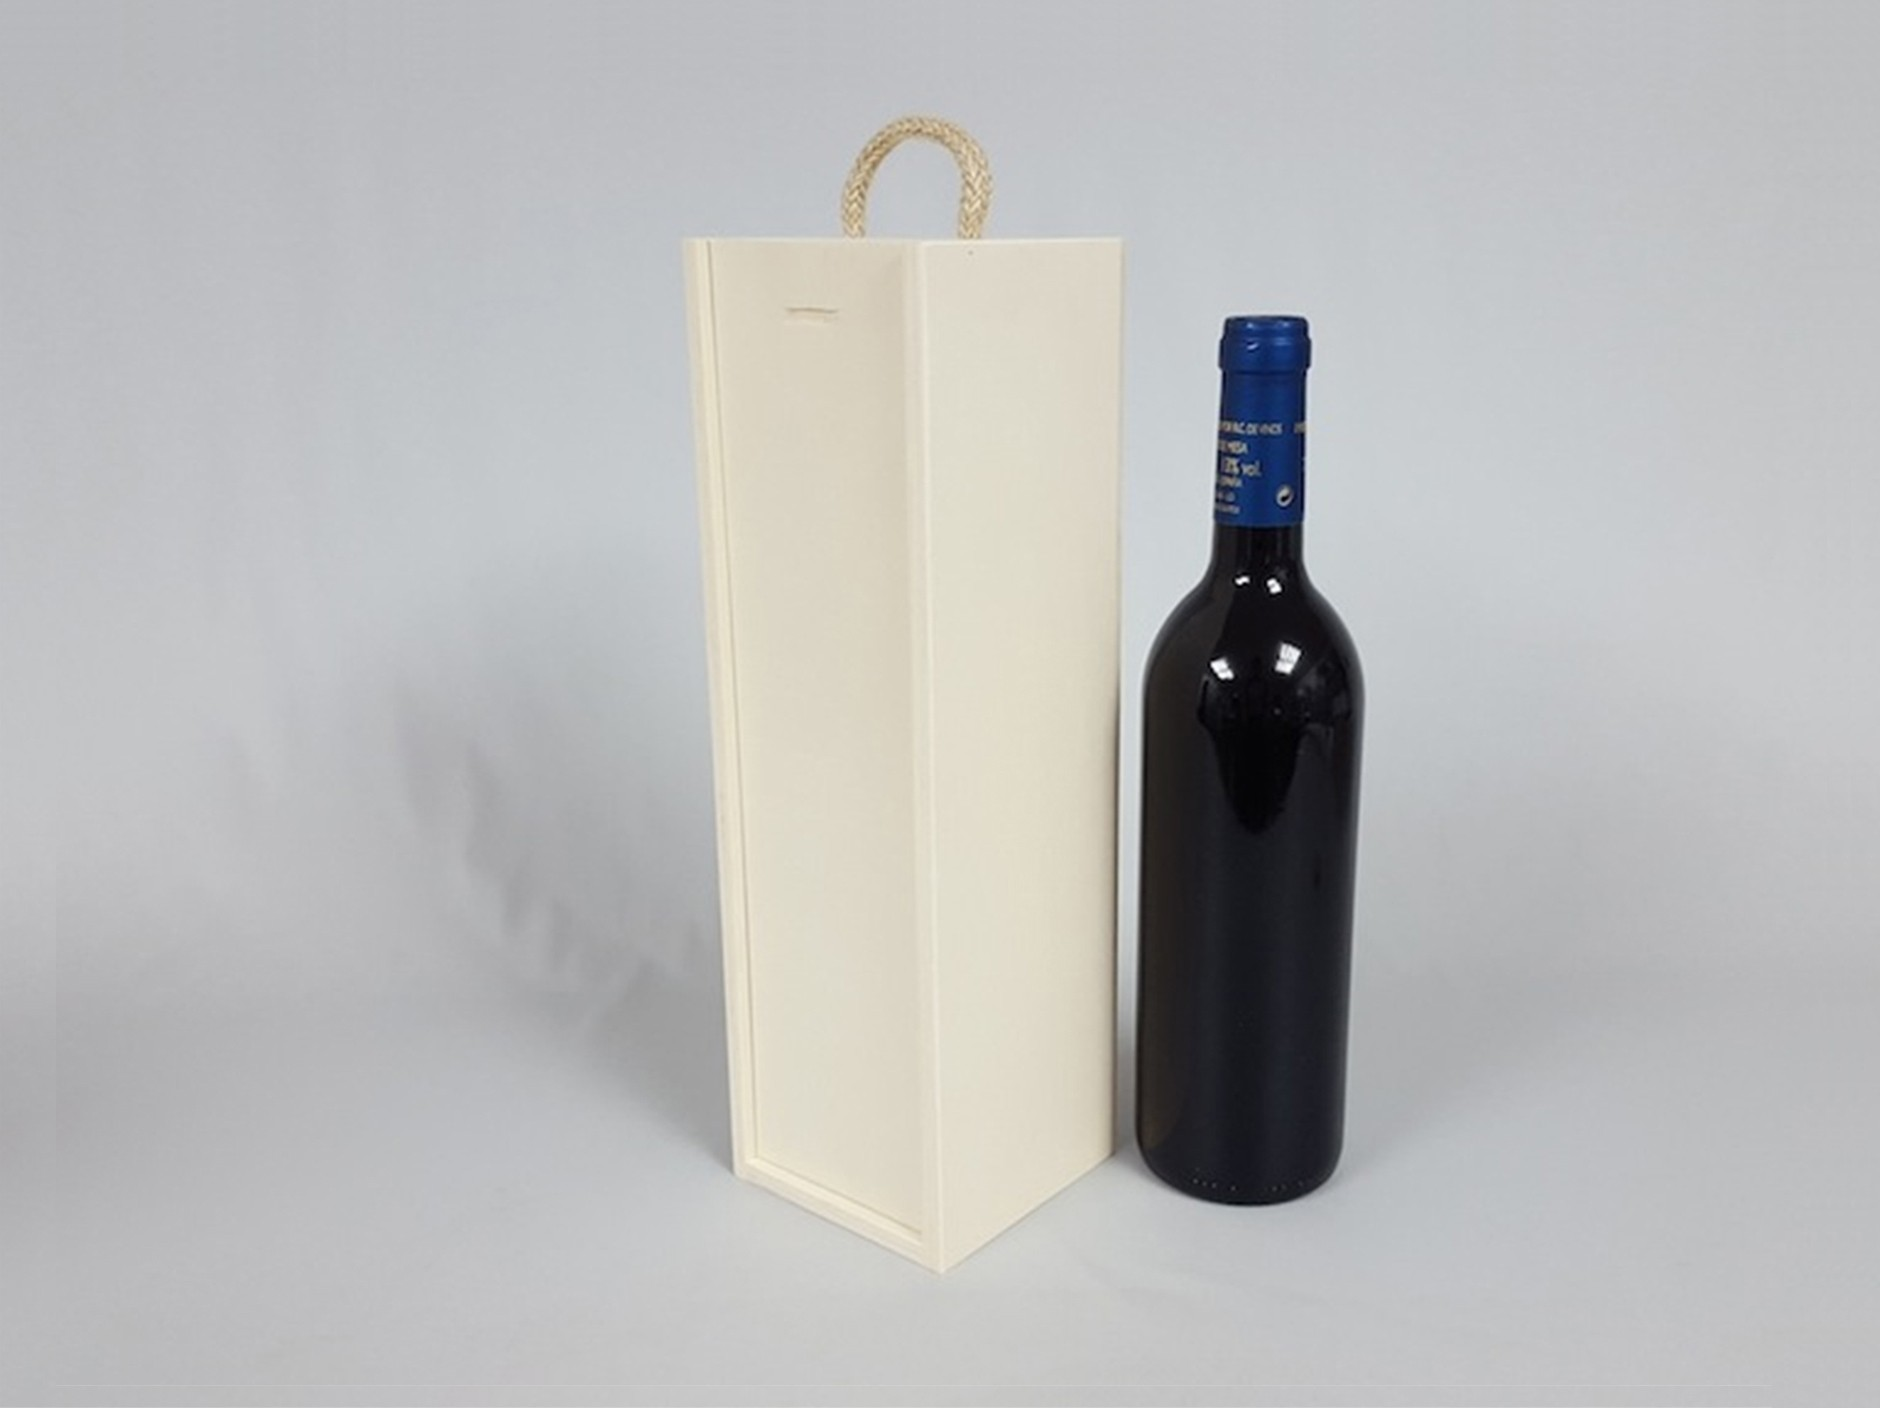 Caja 1 Botella de vino Tapa Corredera Ref.1botTC